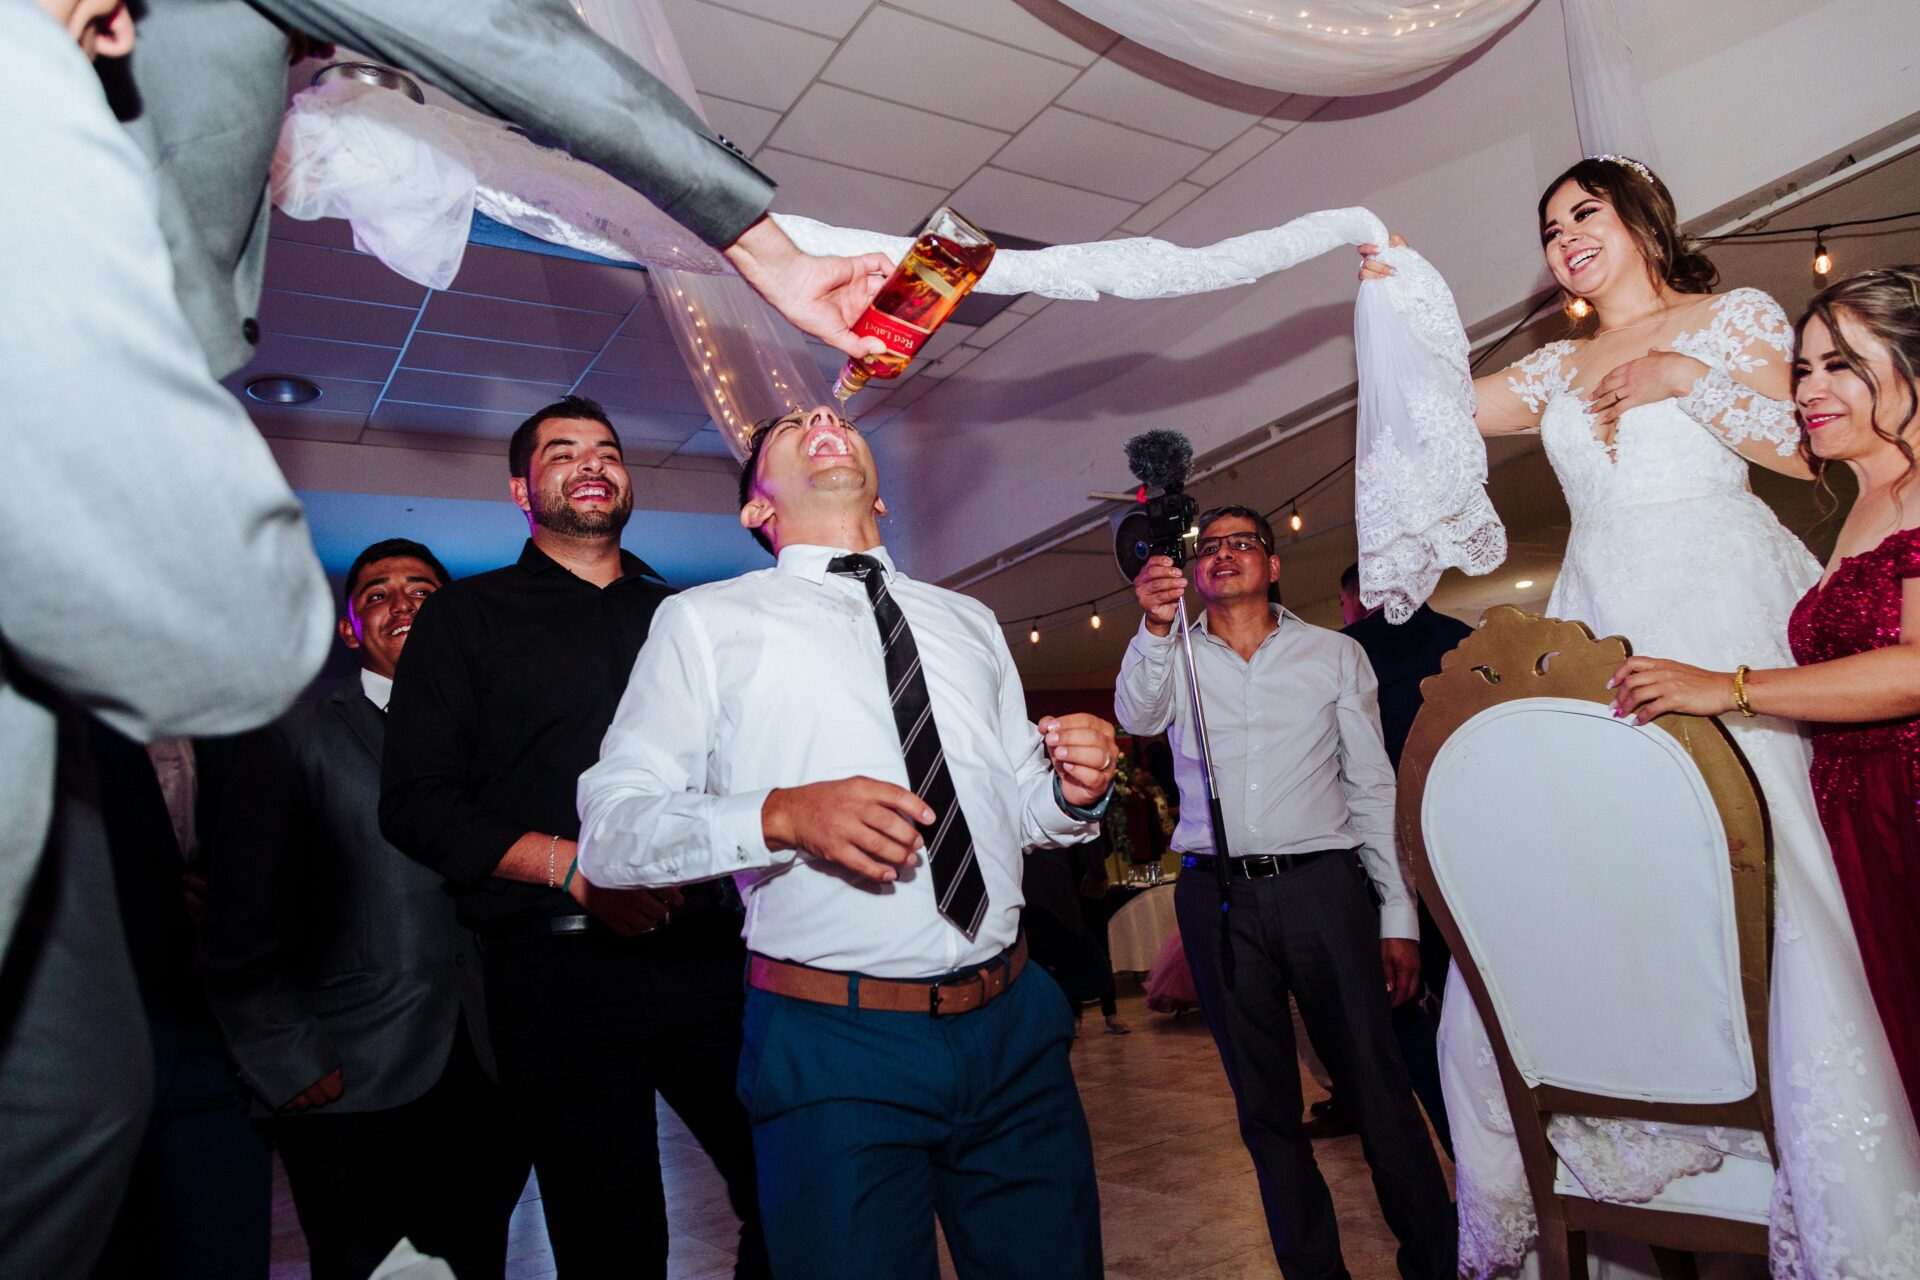 javier_noriega_fotografo_bodas_zacatecas_fresnillo_chihuahua_wedding_photographer25